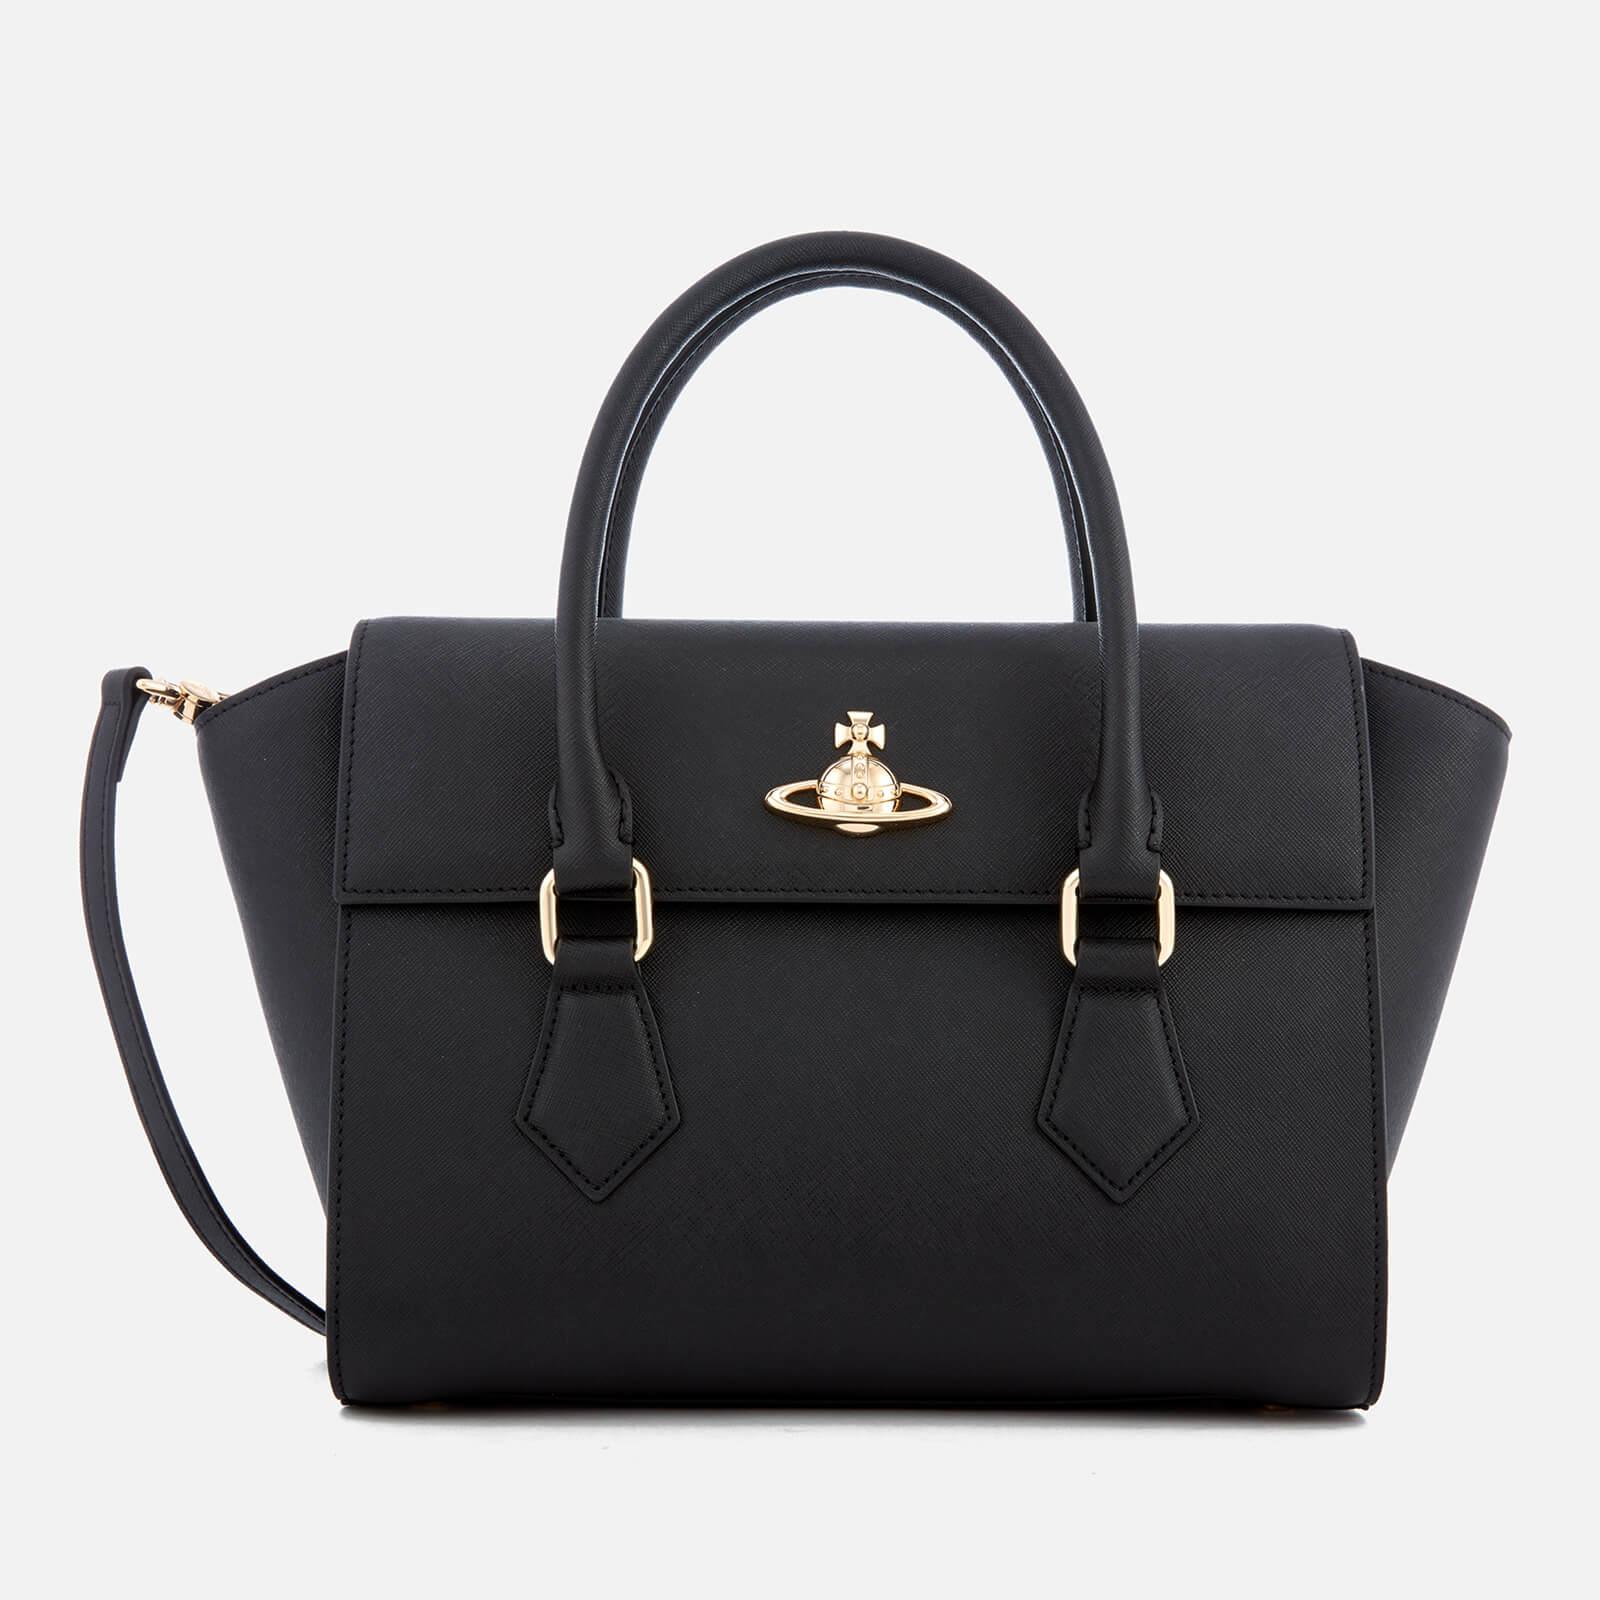 db52621bde2a Vivienne Westwood Women's Pimlico Medium Handbag - Black - Free UK Delivery  over £50